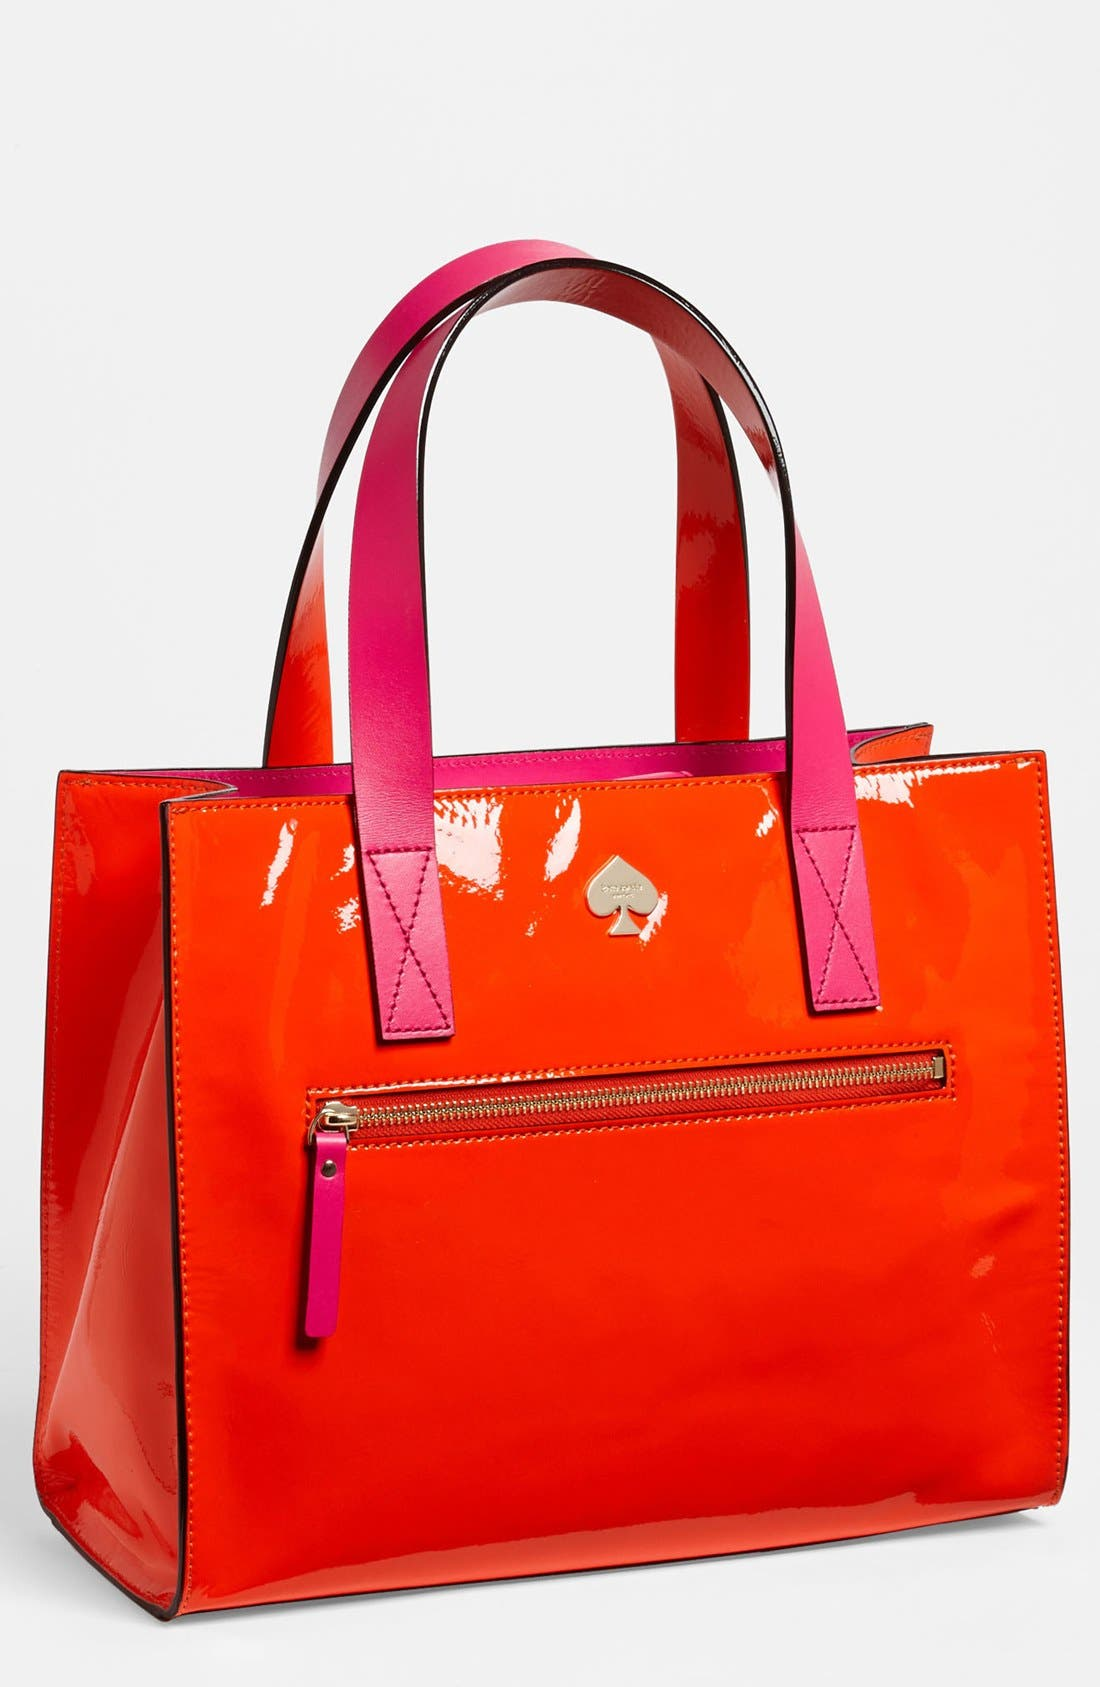 Main Image - kate spade new york 'flicker - grayce' satchel